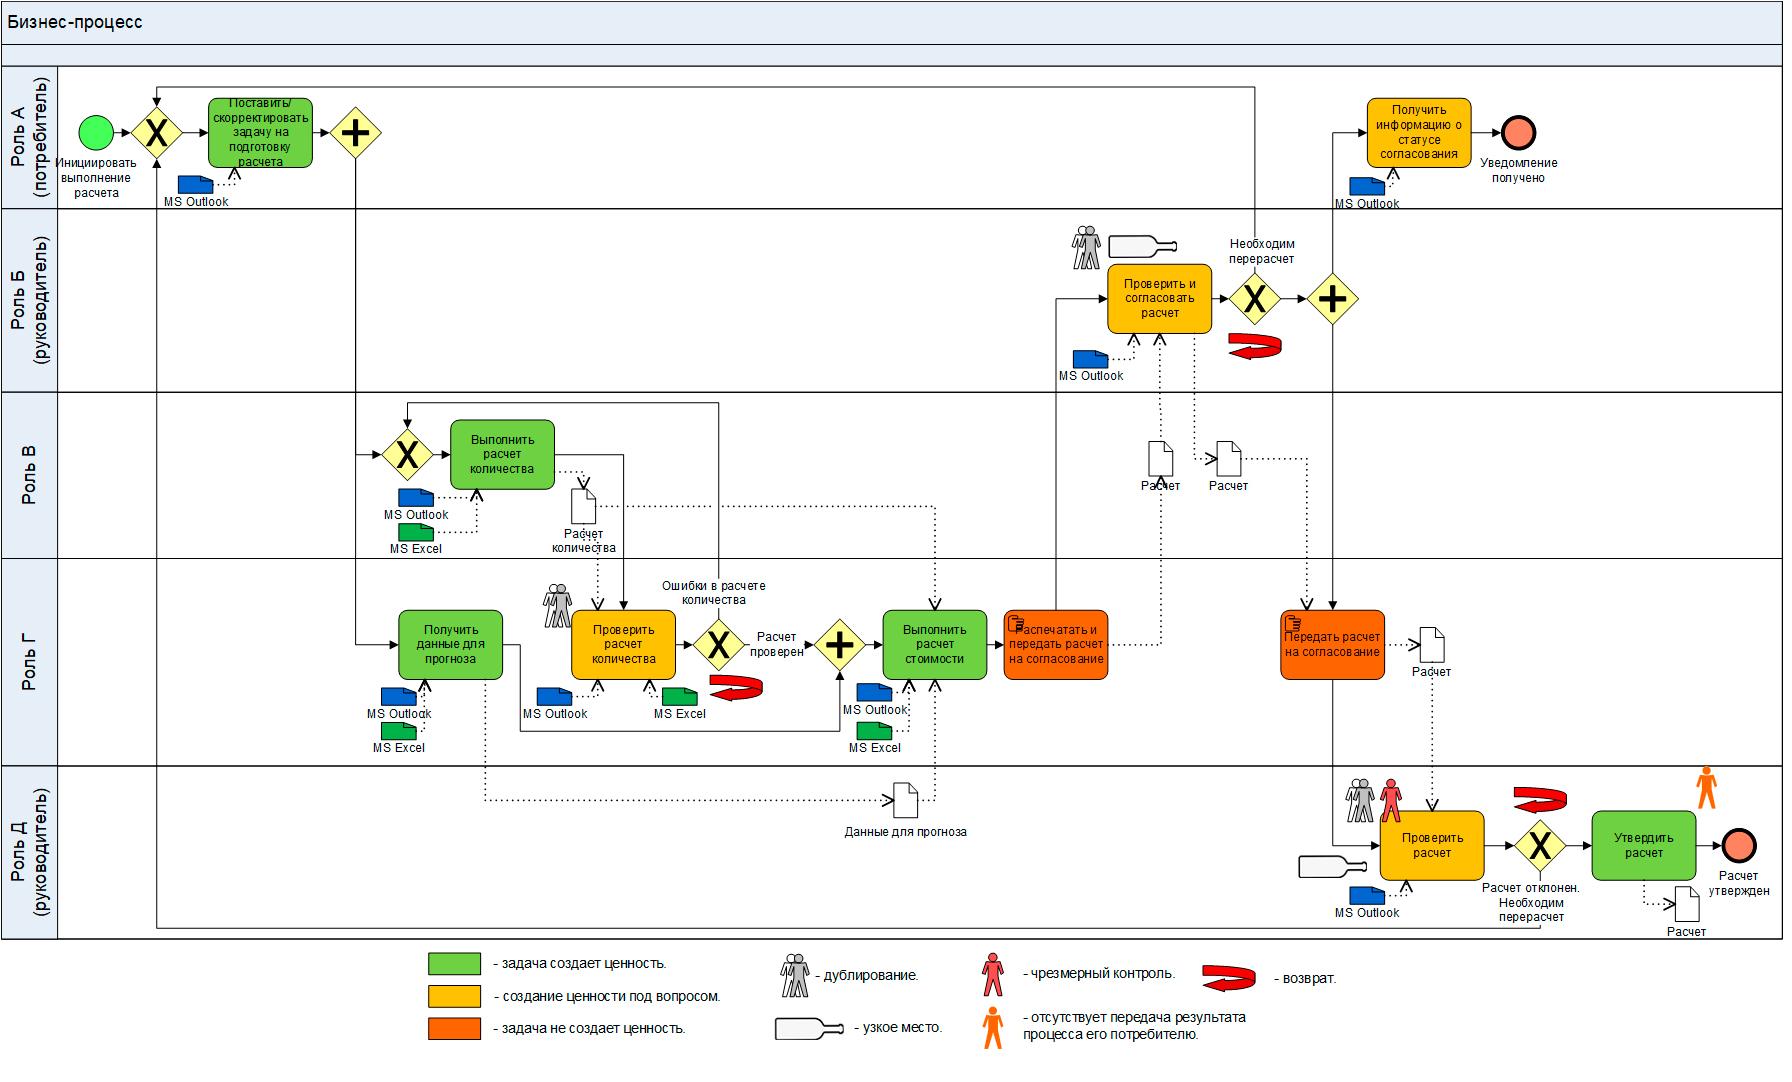 Бизнес-процесс на ладони: простые методы анализа и оптимизации